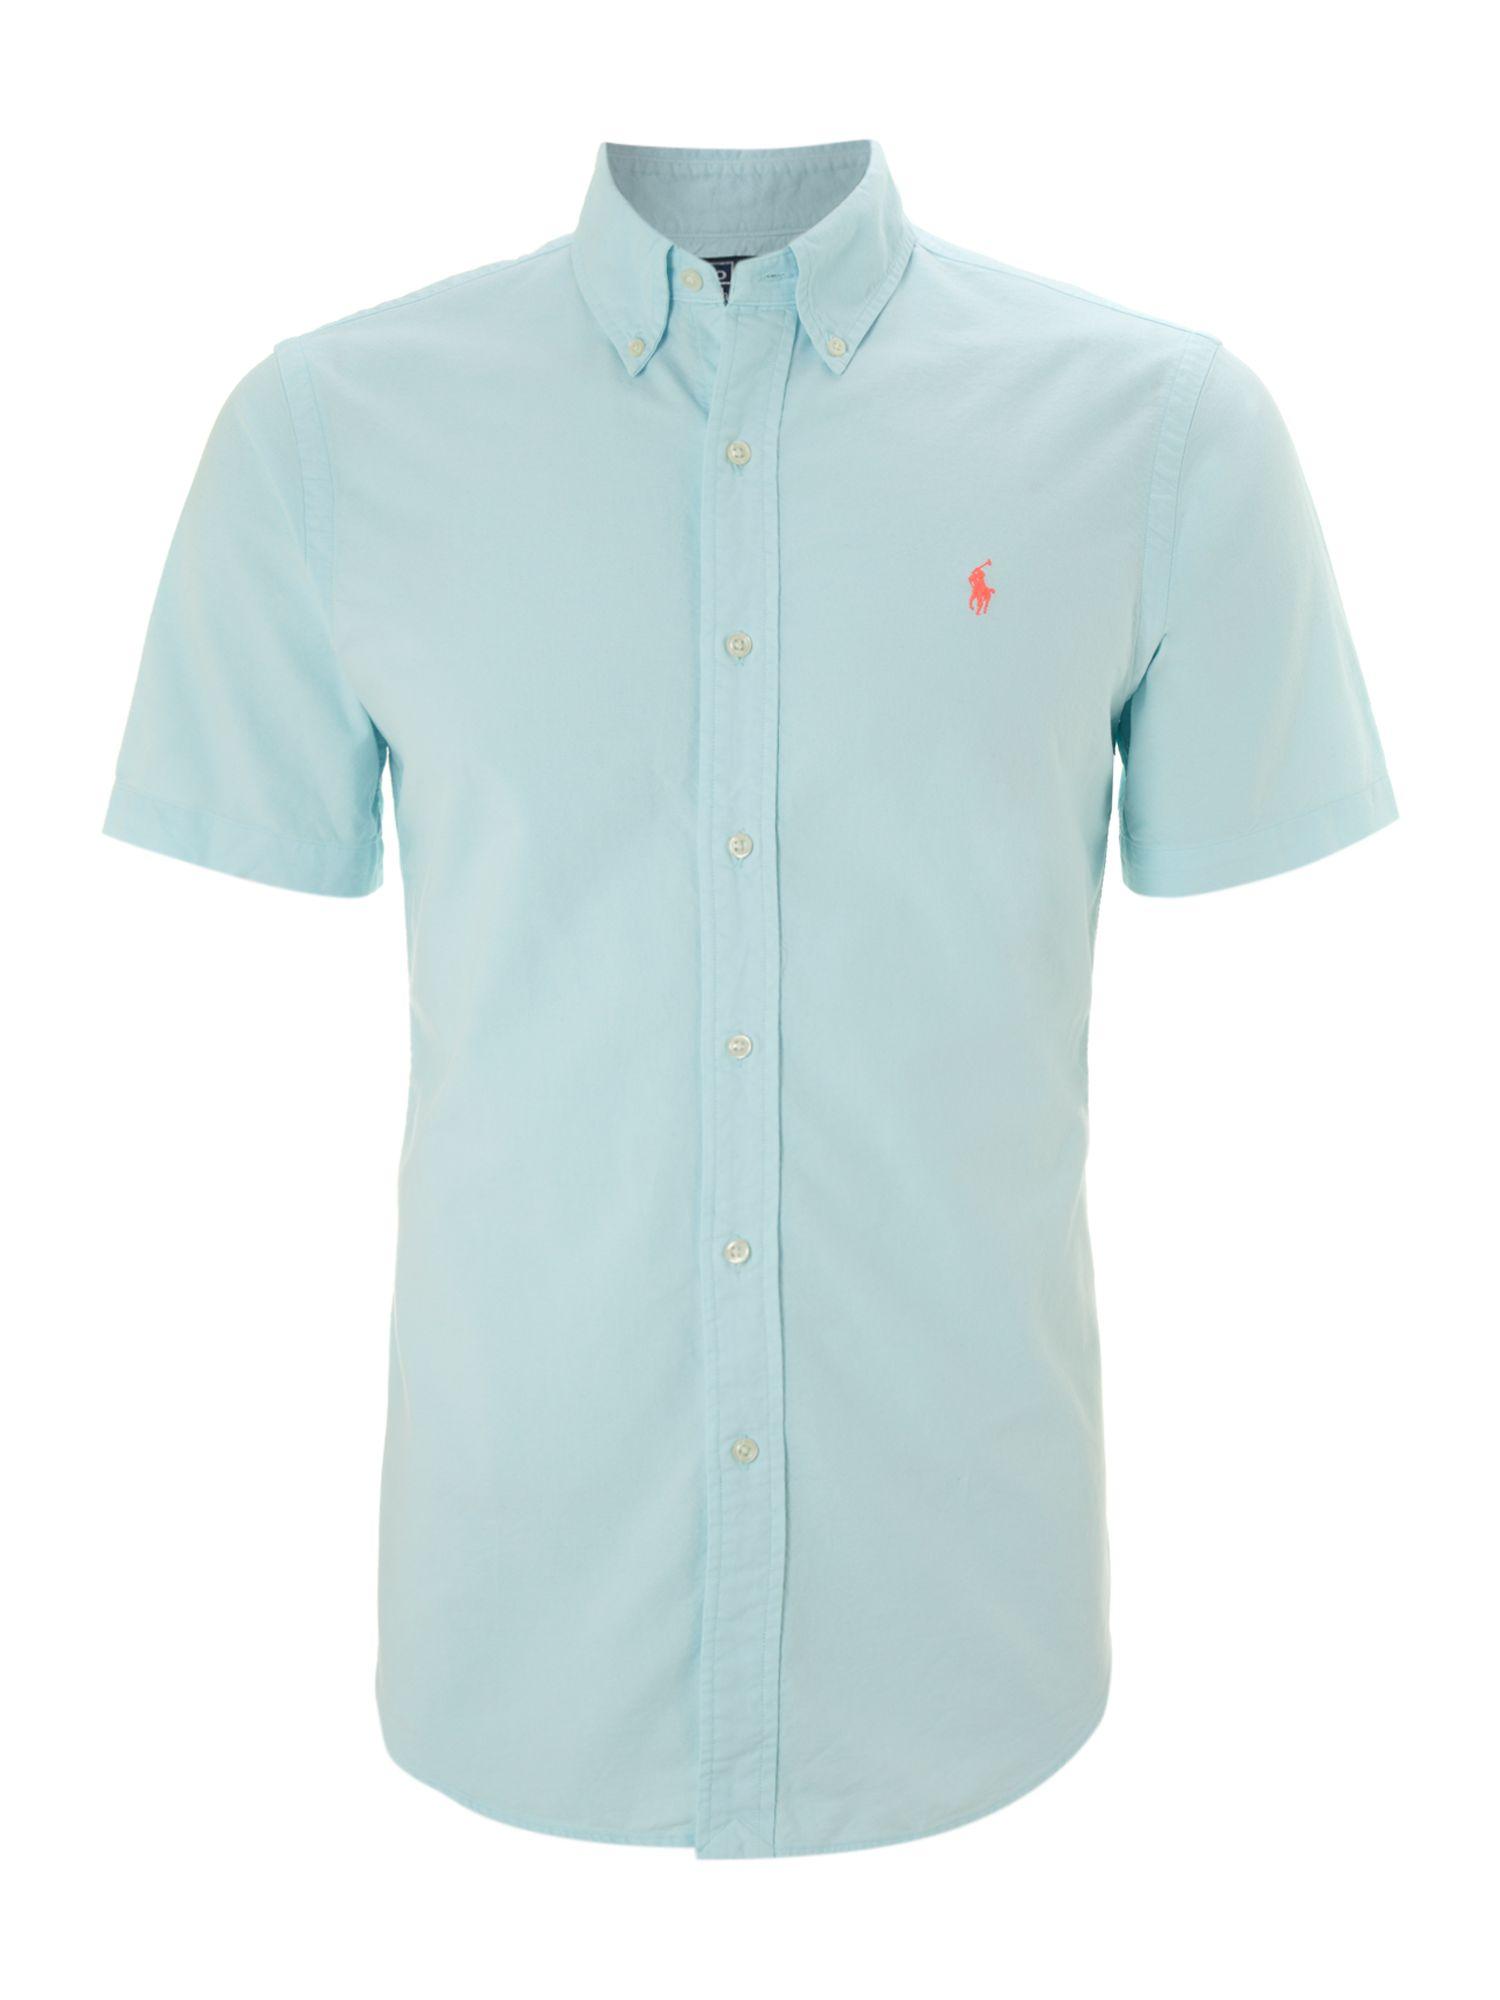 Polo Ralph Lauren Short Sleeve Custom Fit Shirt In Blue